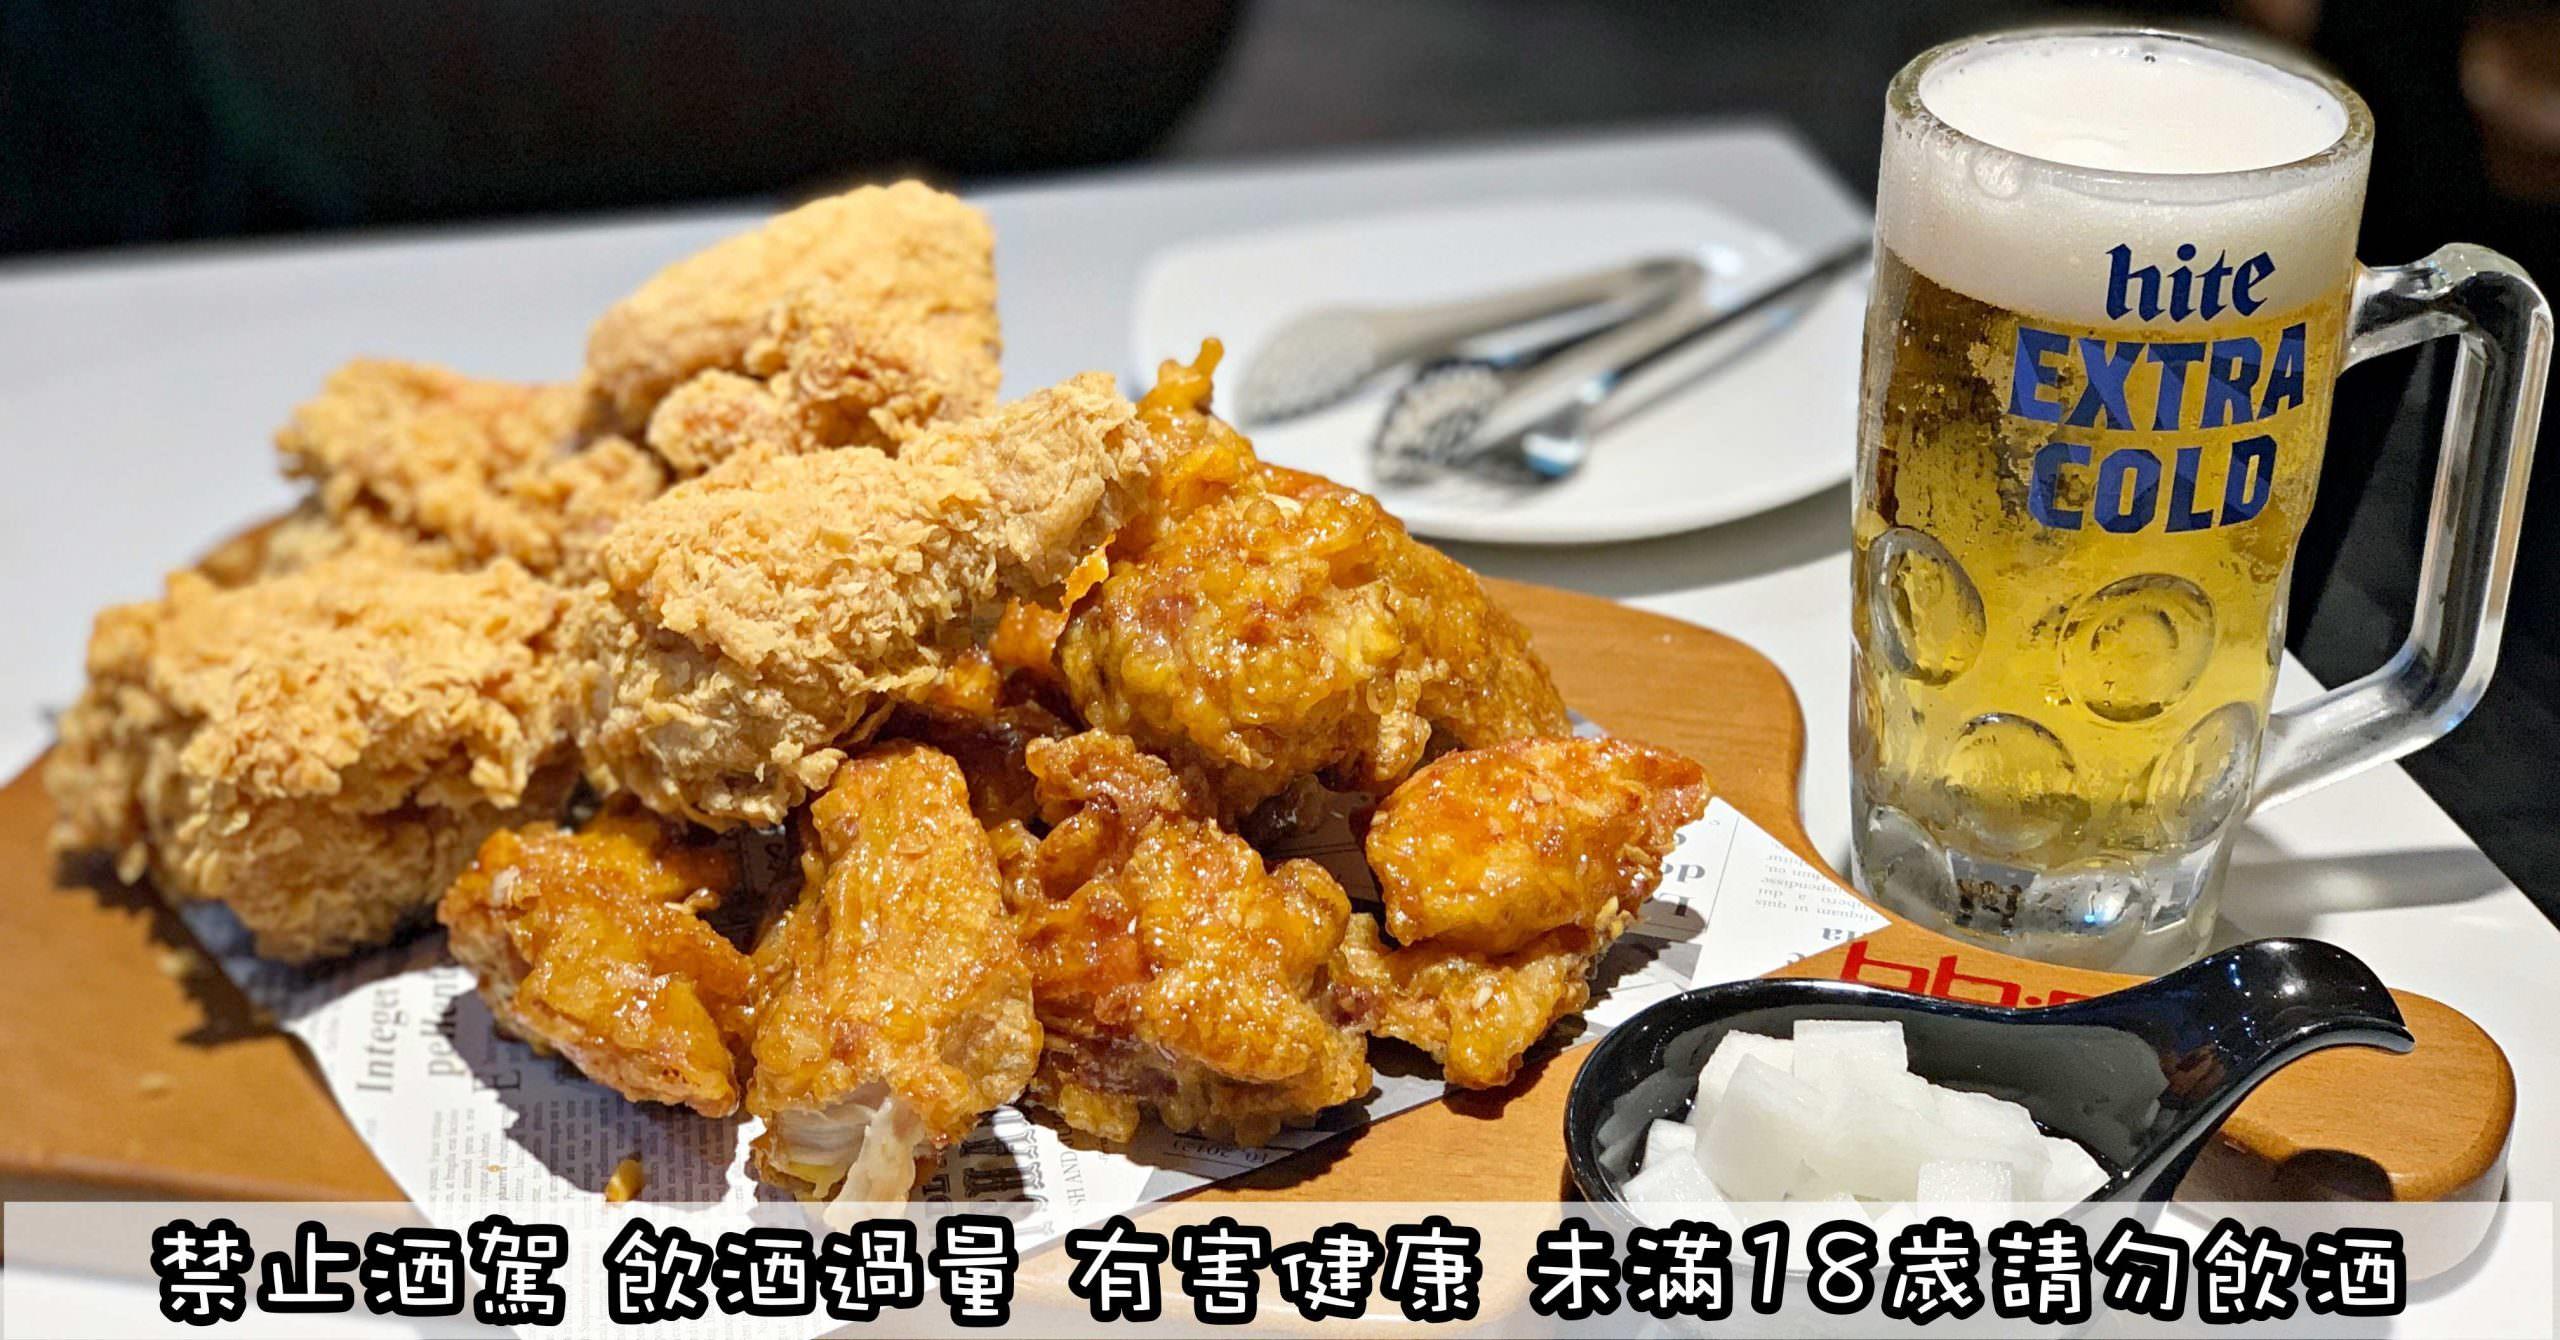 bb.q CHICKEN|南京復興美食-鬼怪炸雞 BBQ炸雞 菜單 價錢